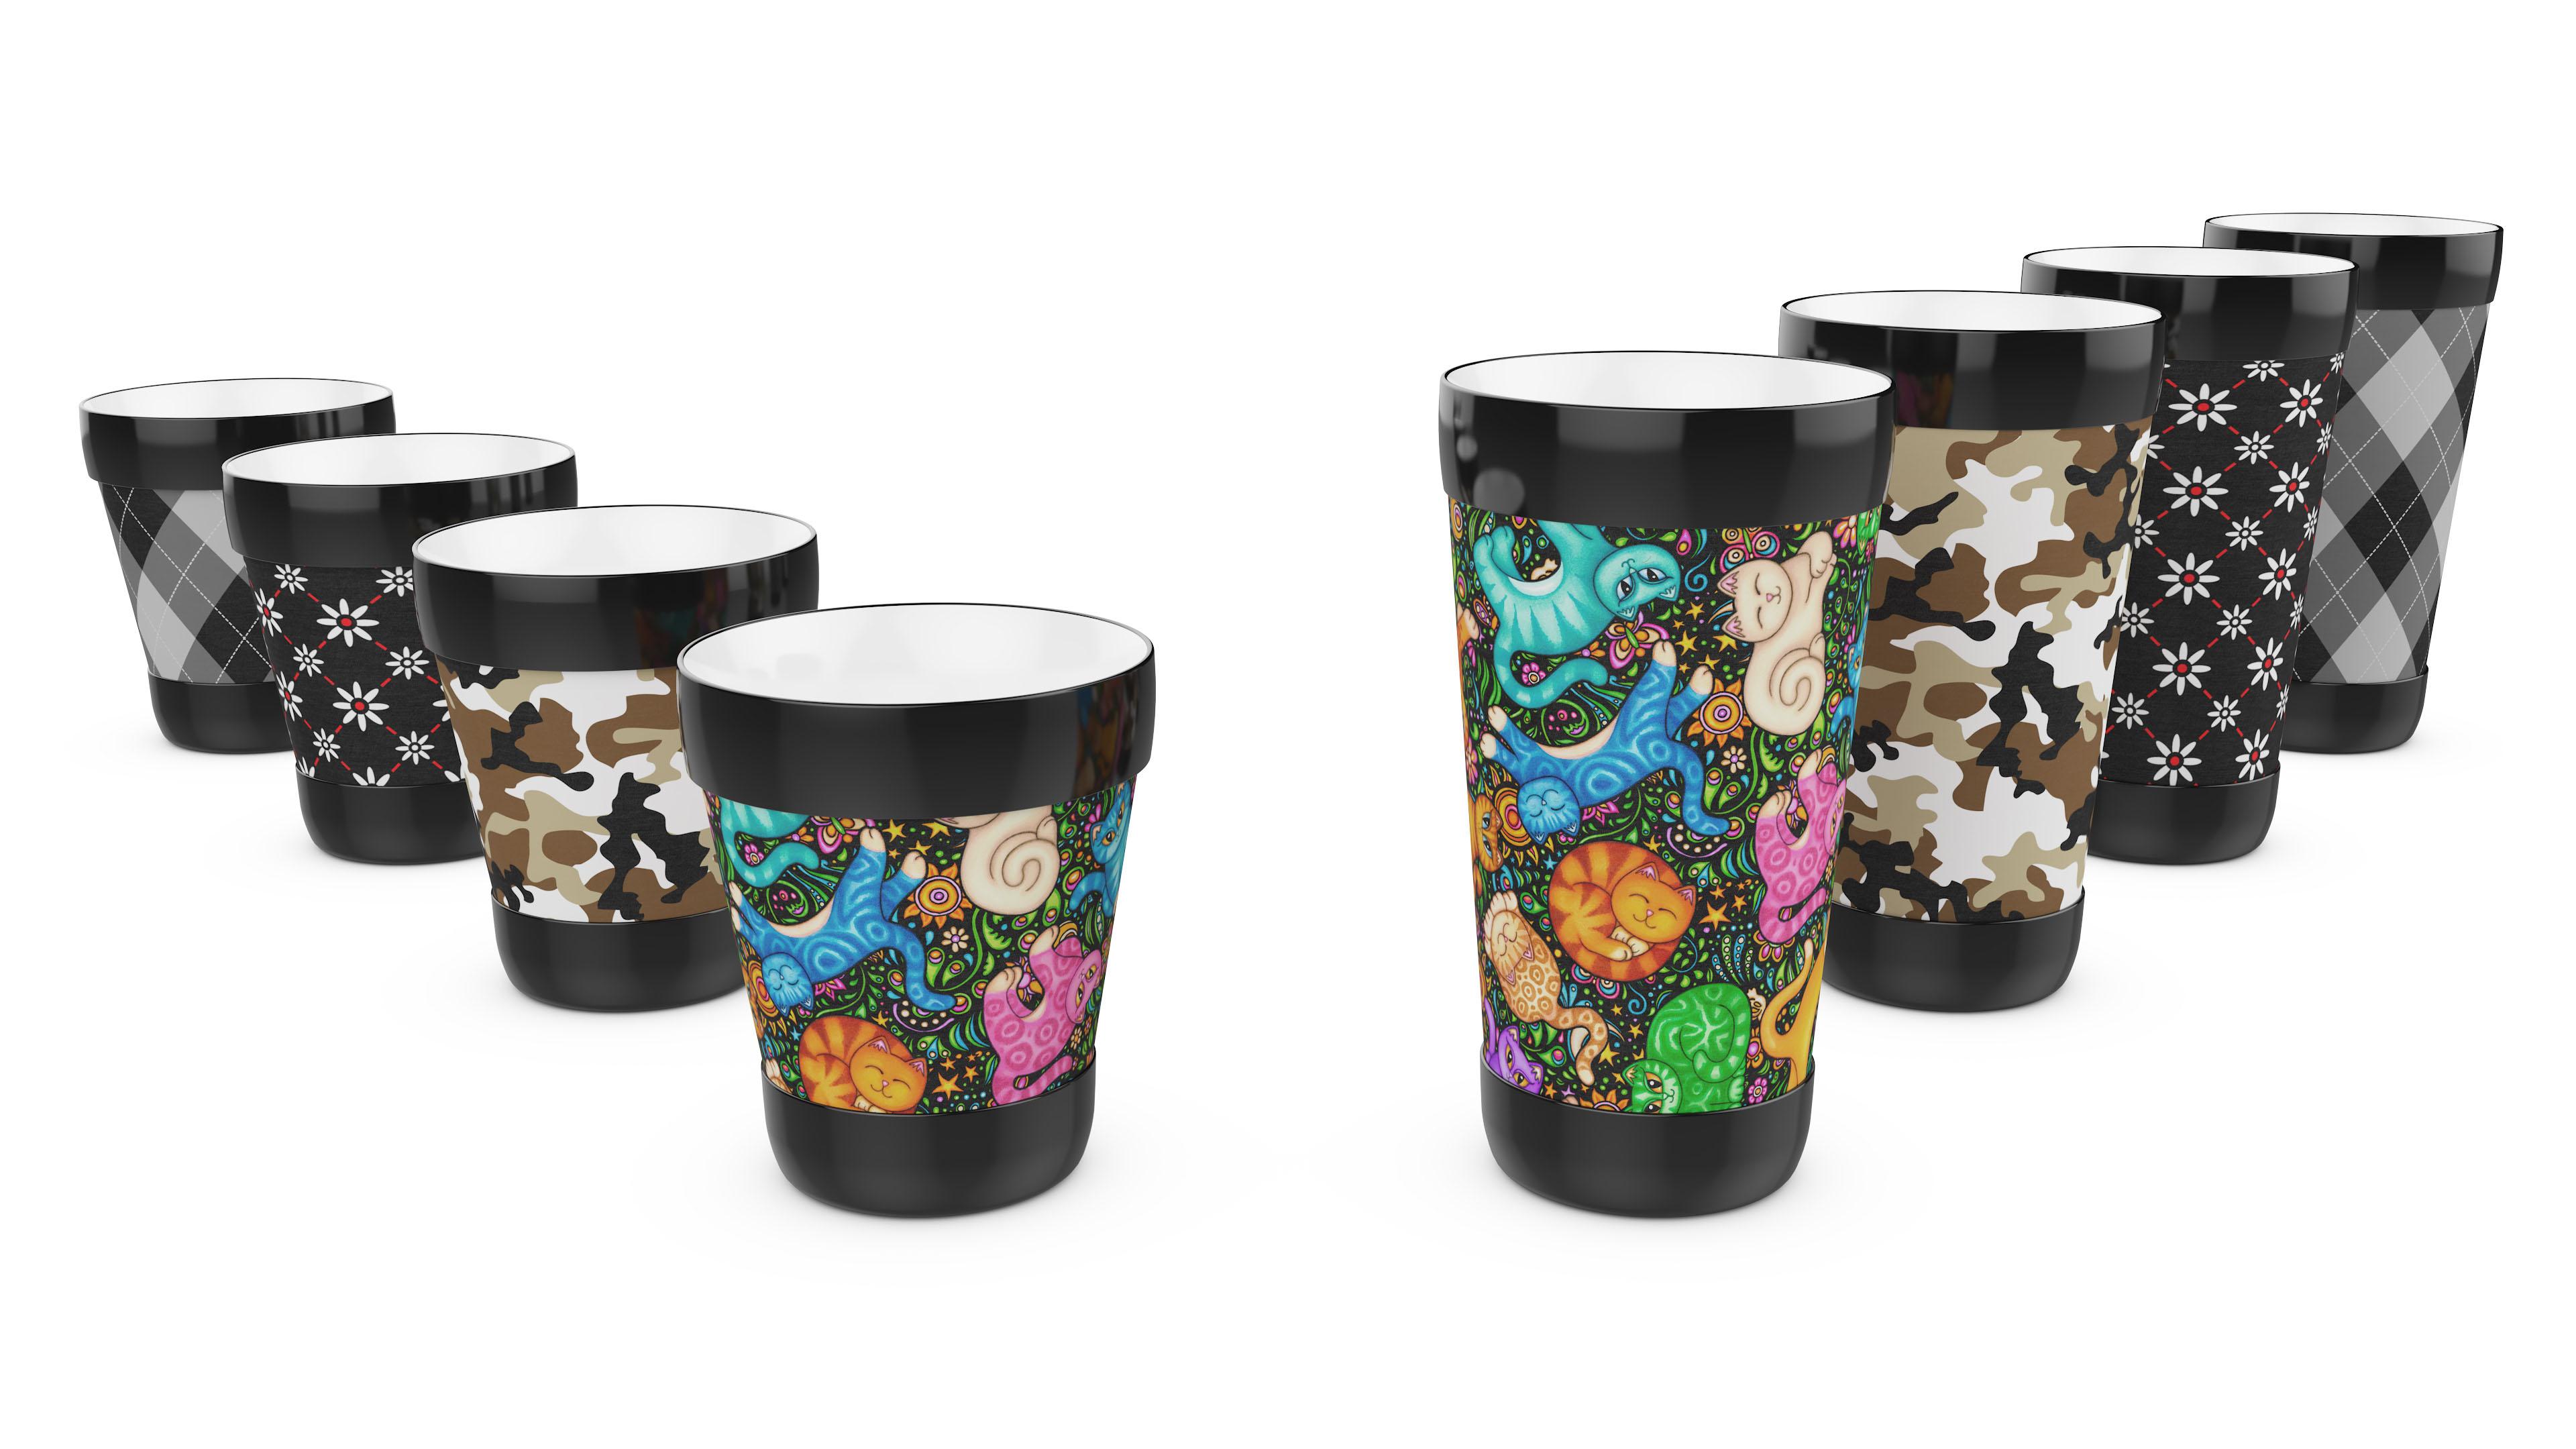 Mugzie drink tumbler cups in different patterns